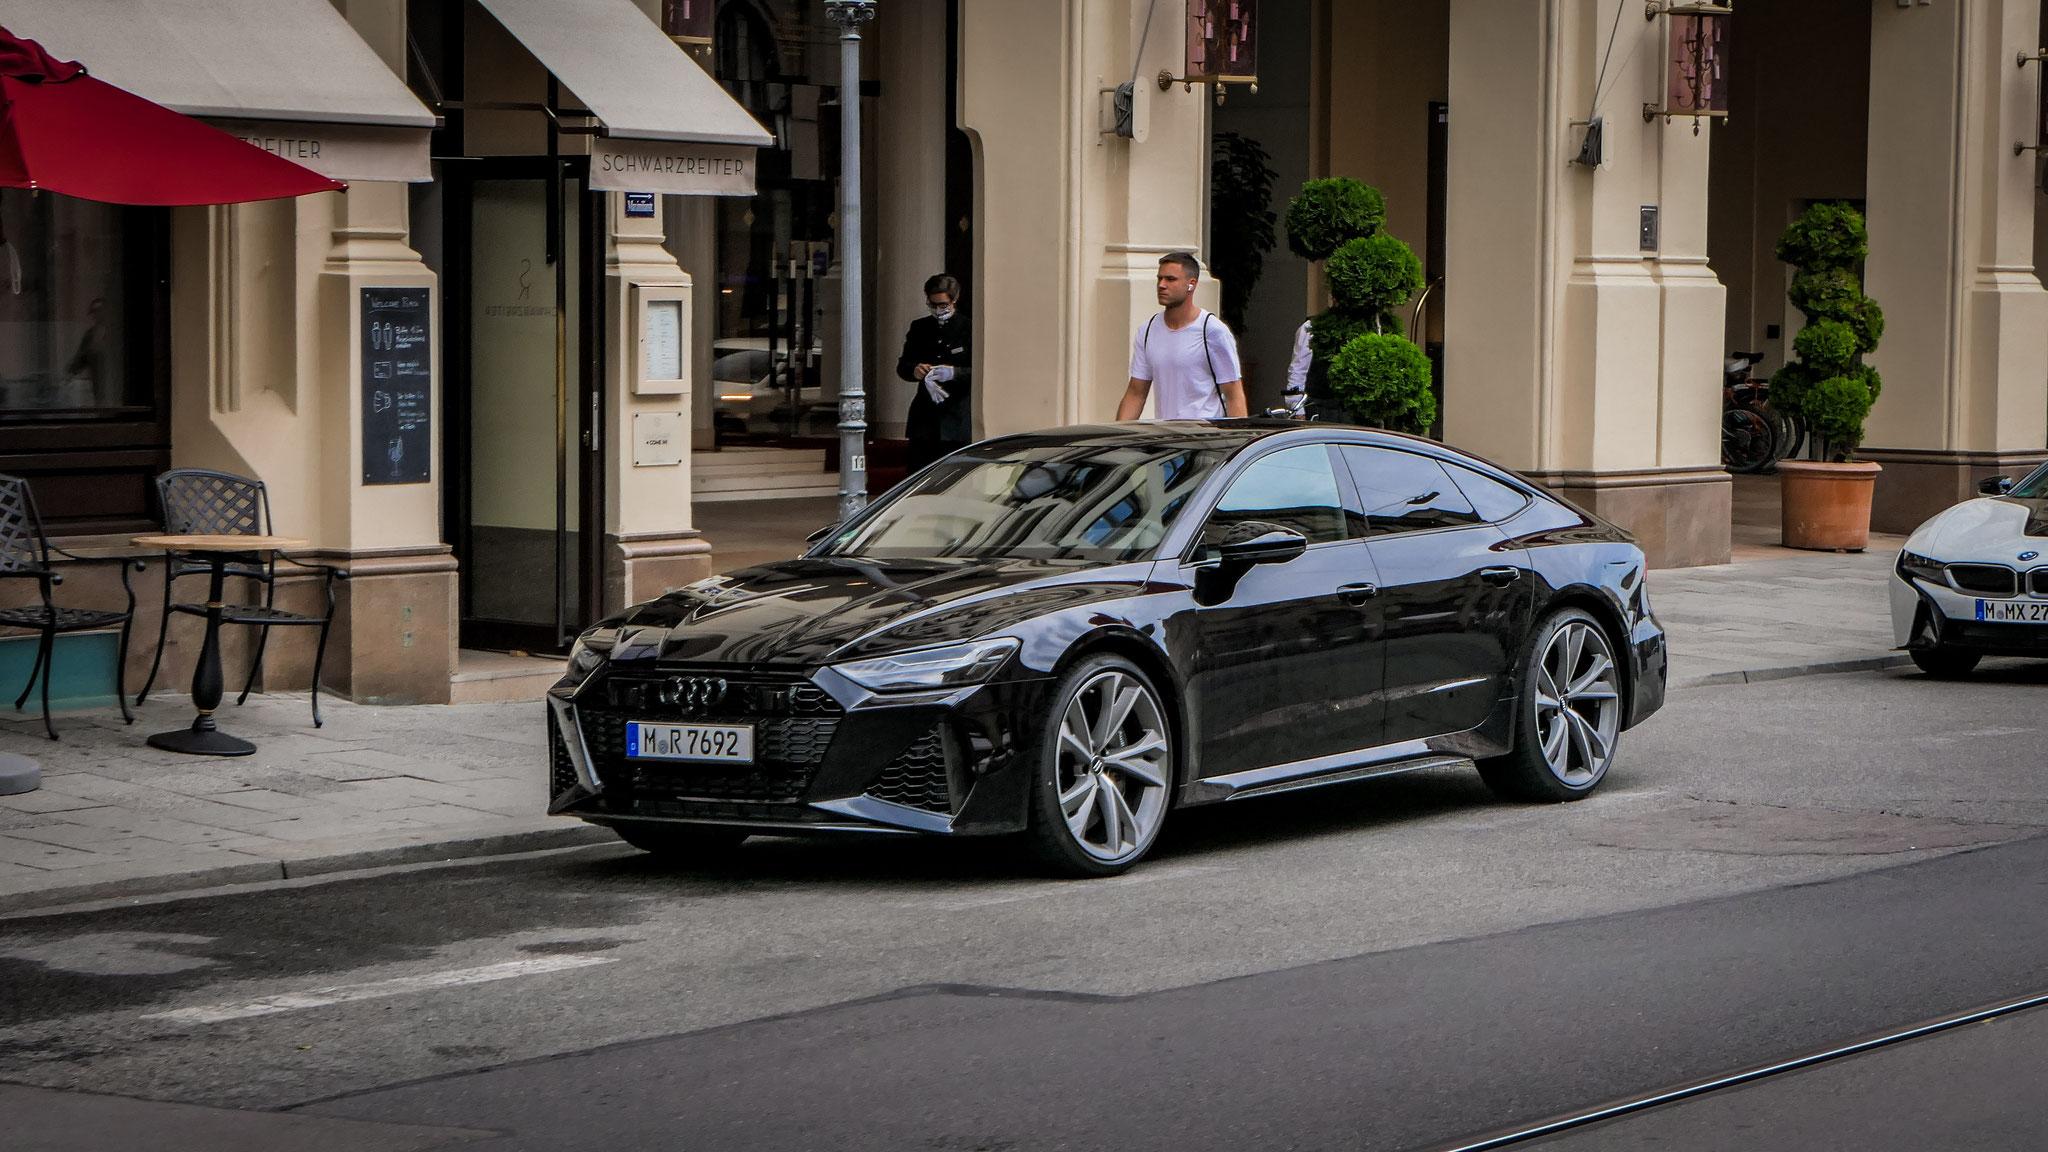 Audi RS7 - M-R-7692